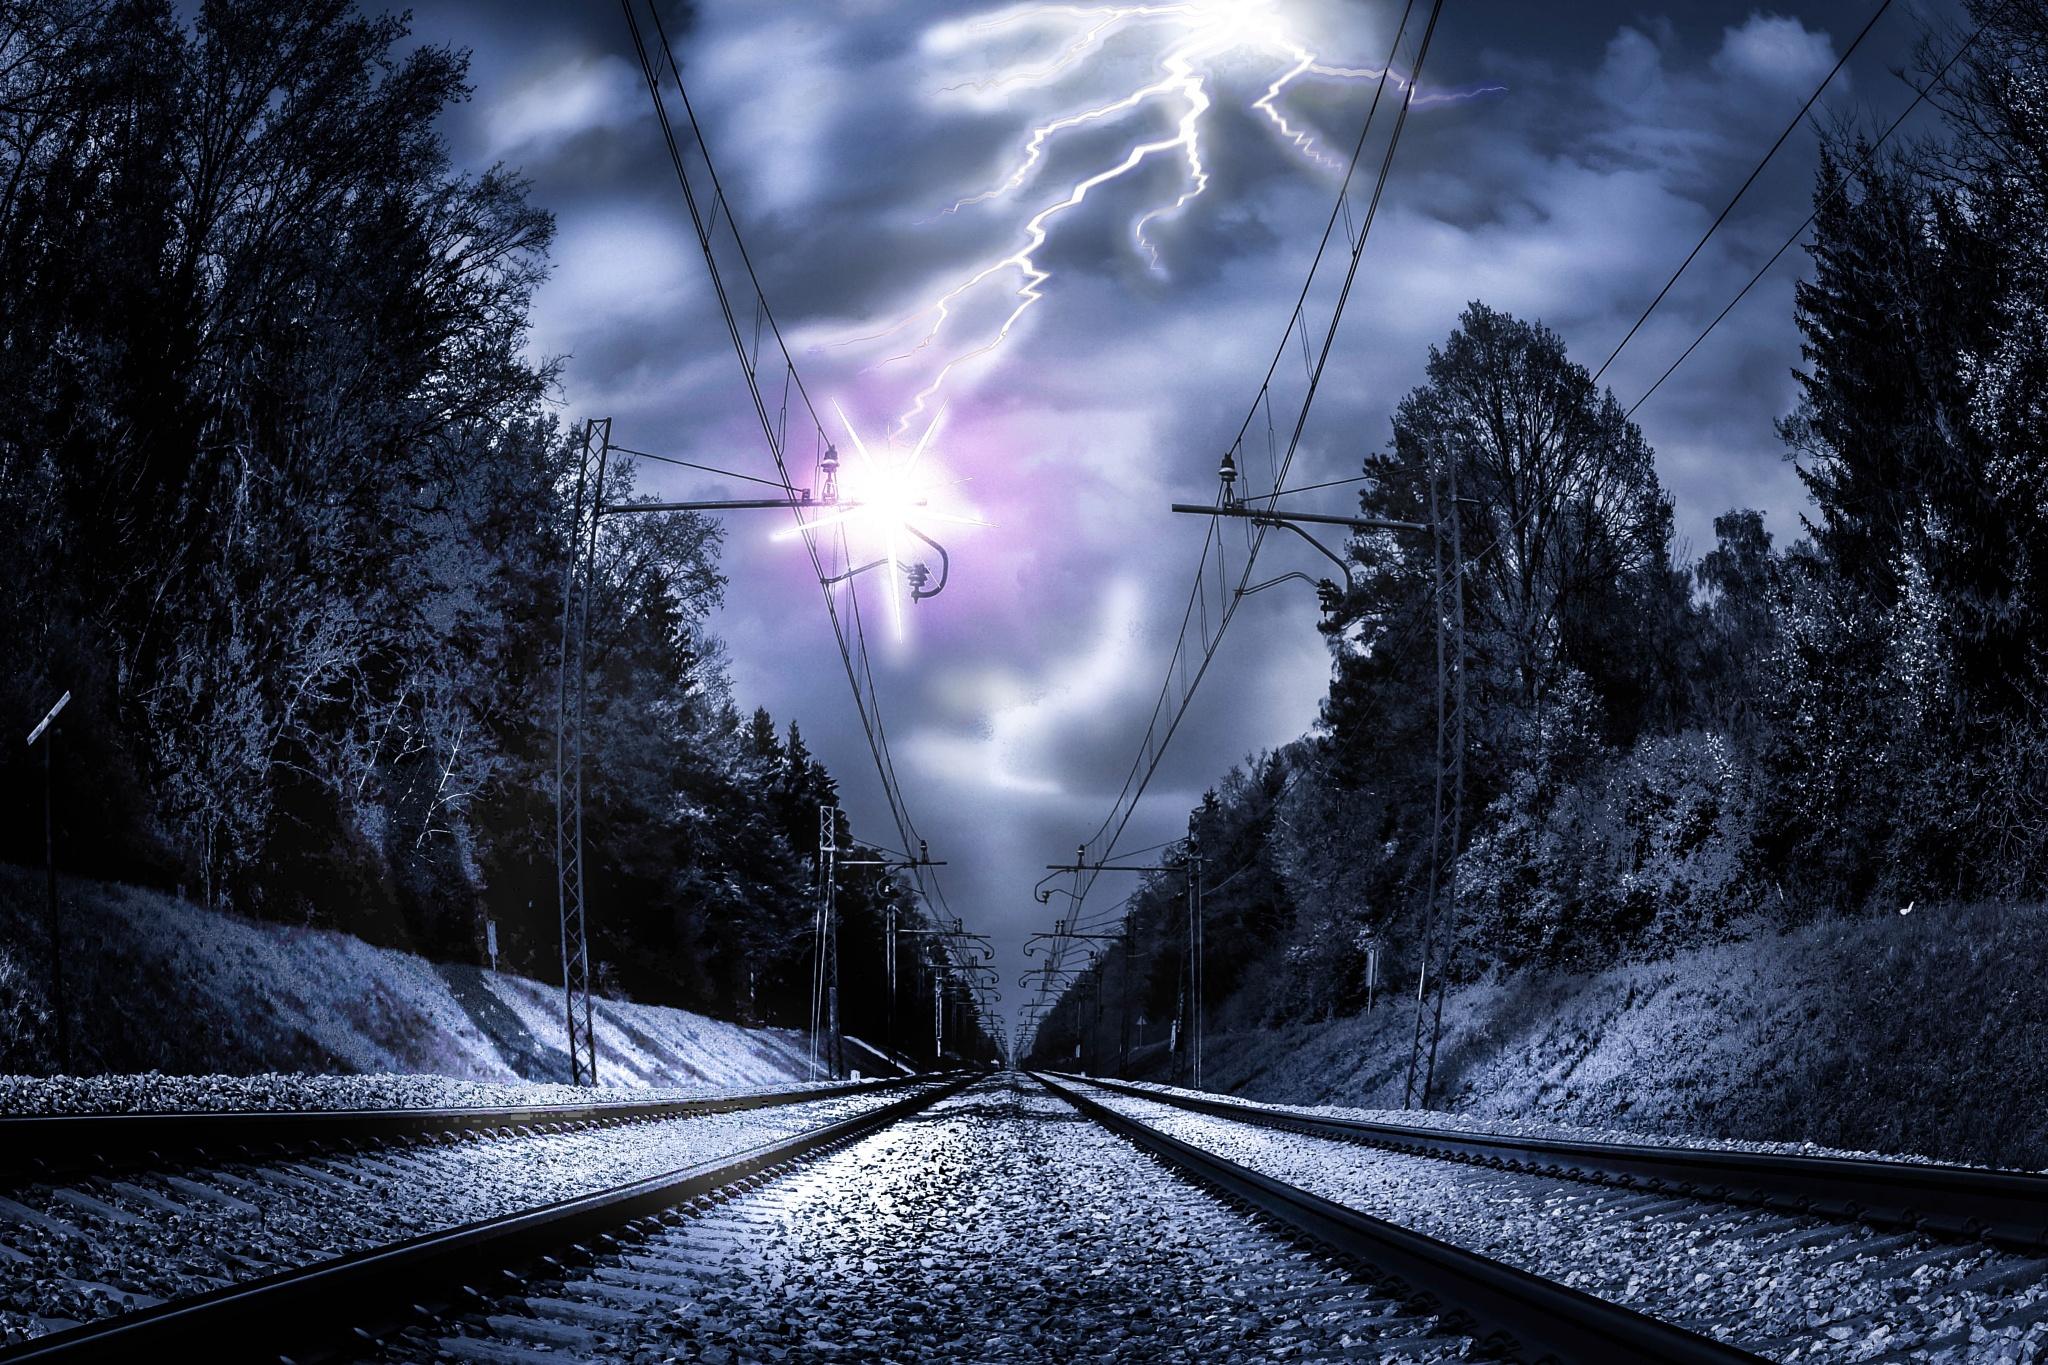 light by Darko Golnar